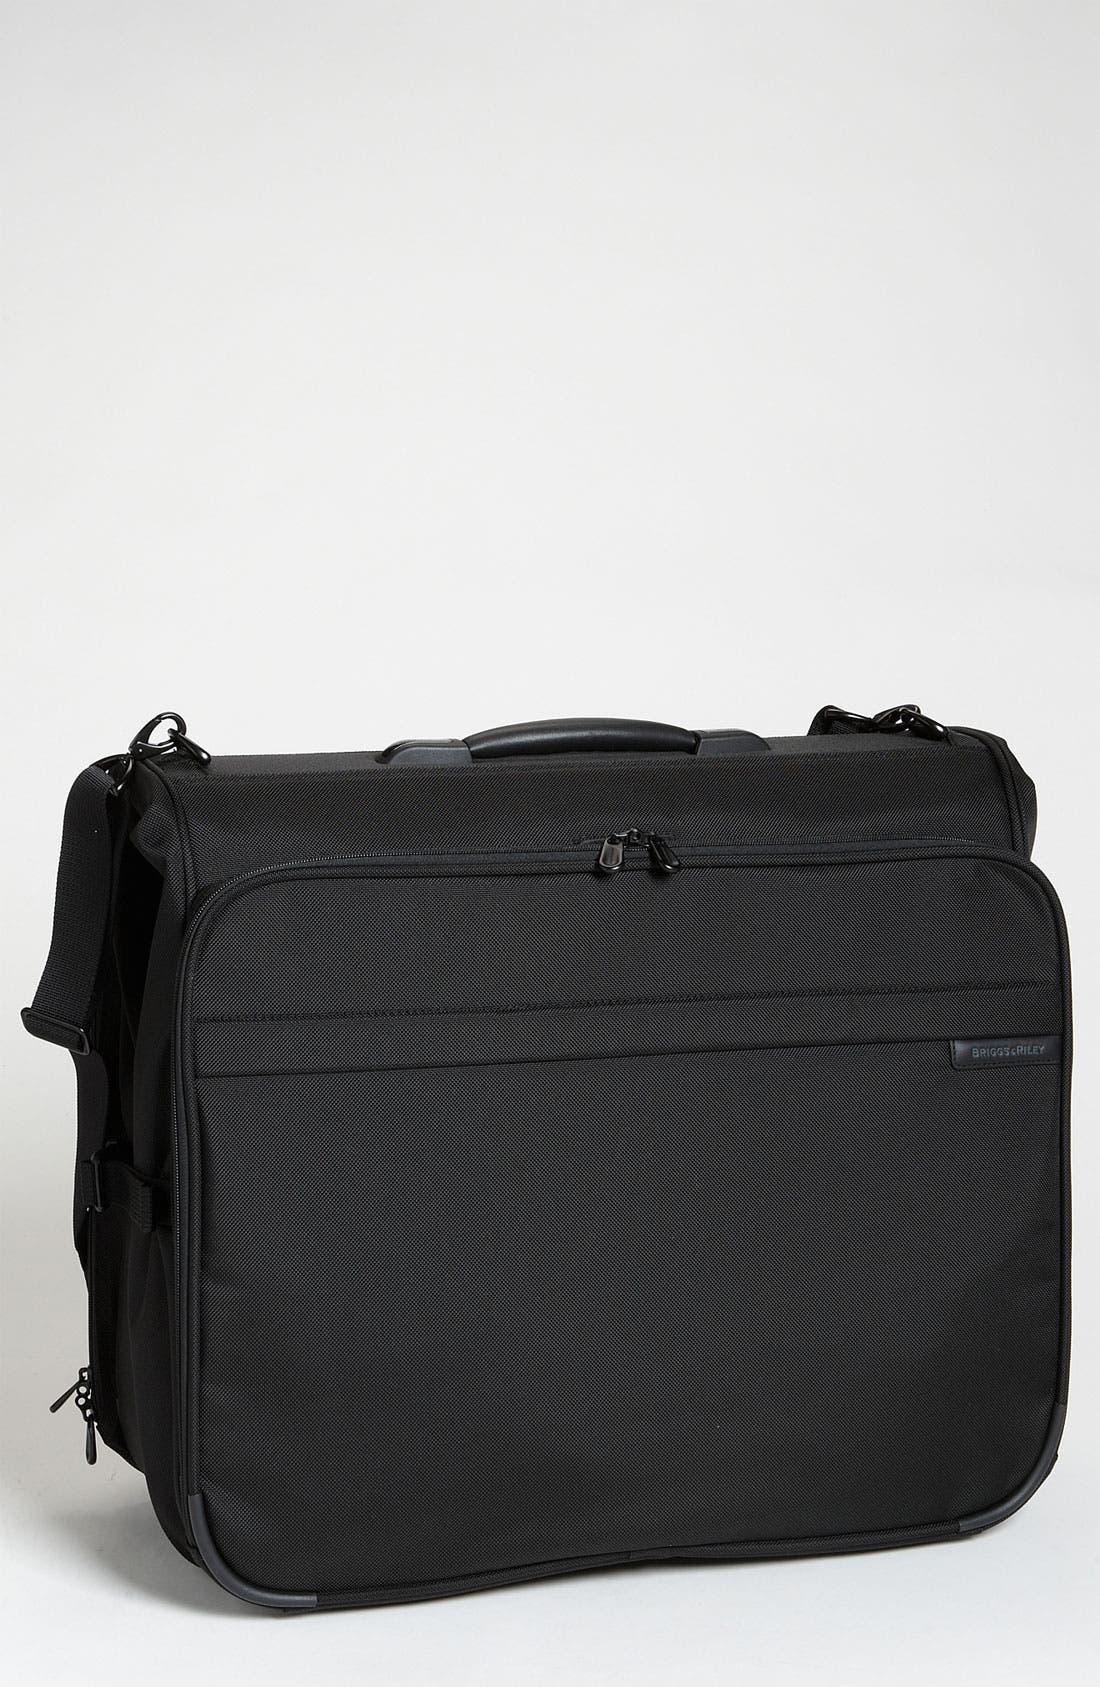 BRIGGS & RILEY 'Baseline - Deluxe' Garment Bag